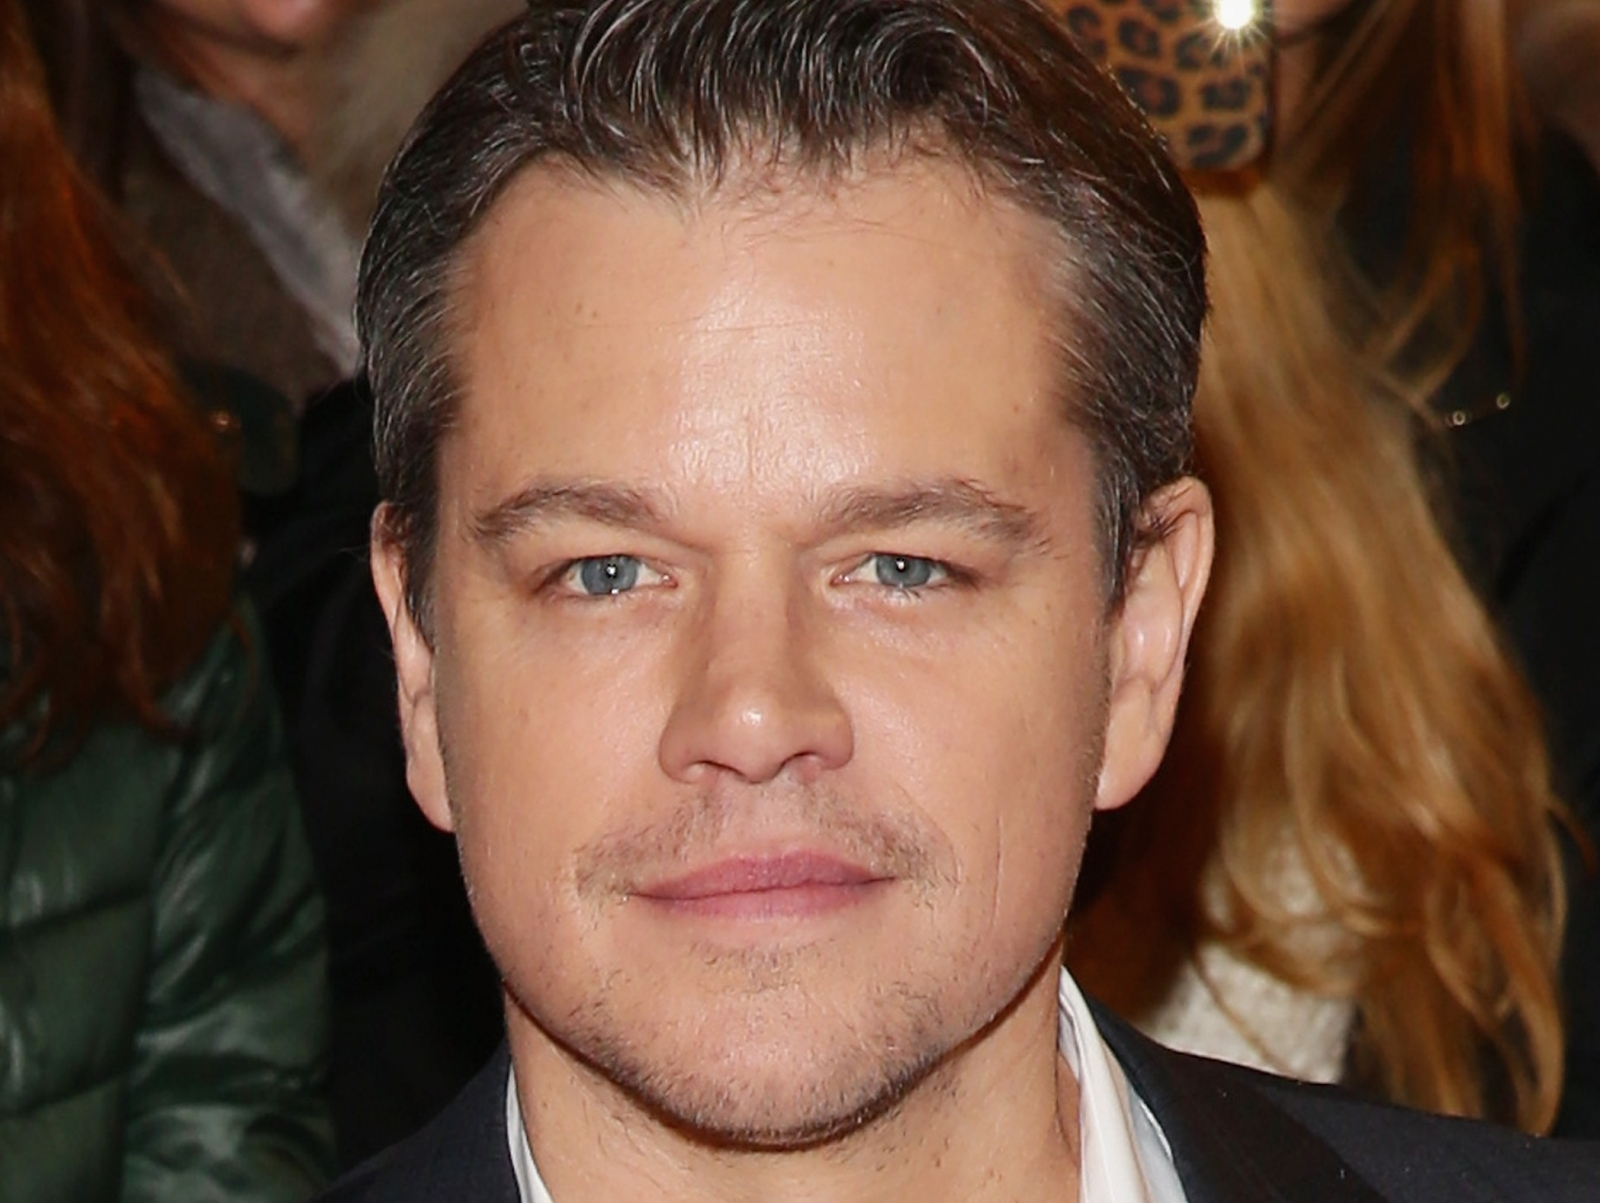 Matt Damon attends 'The Monuments Men' premiere